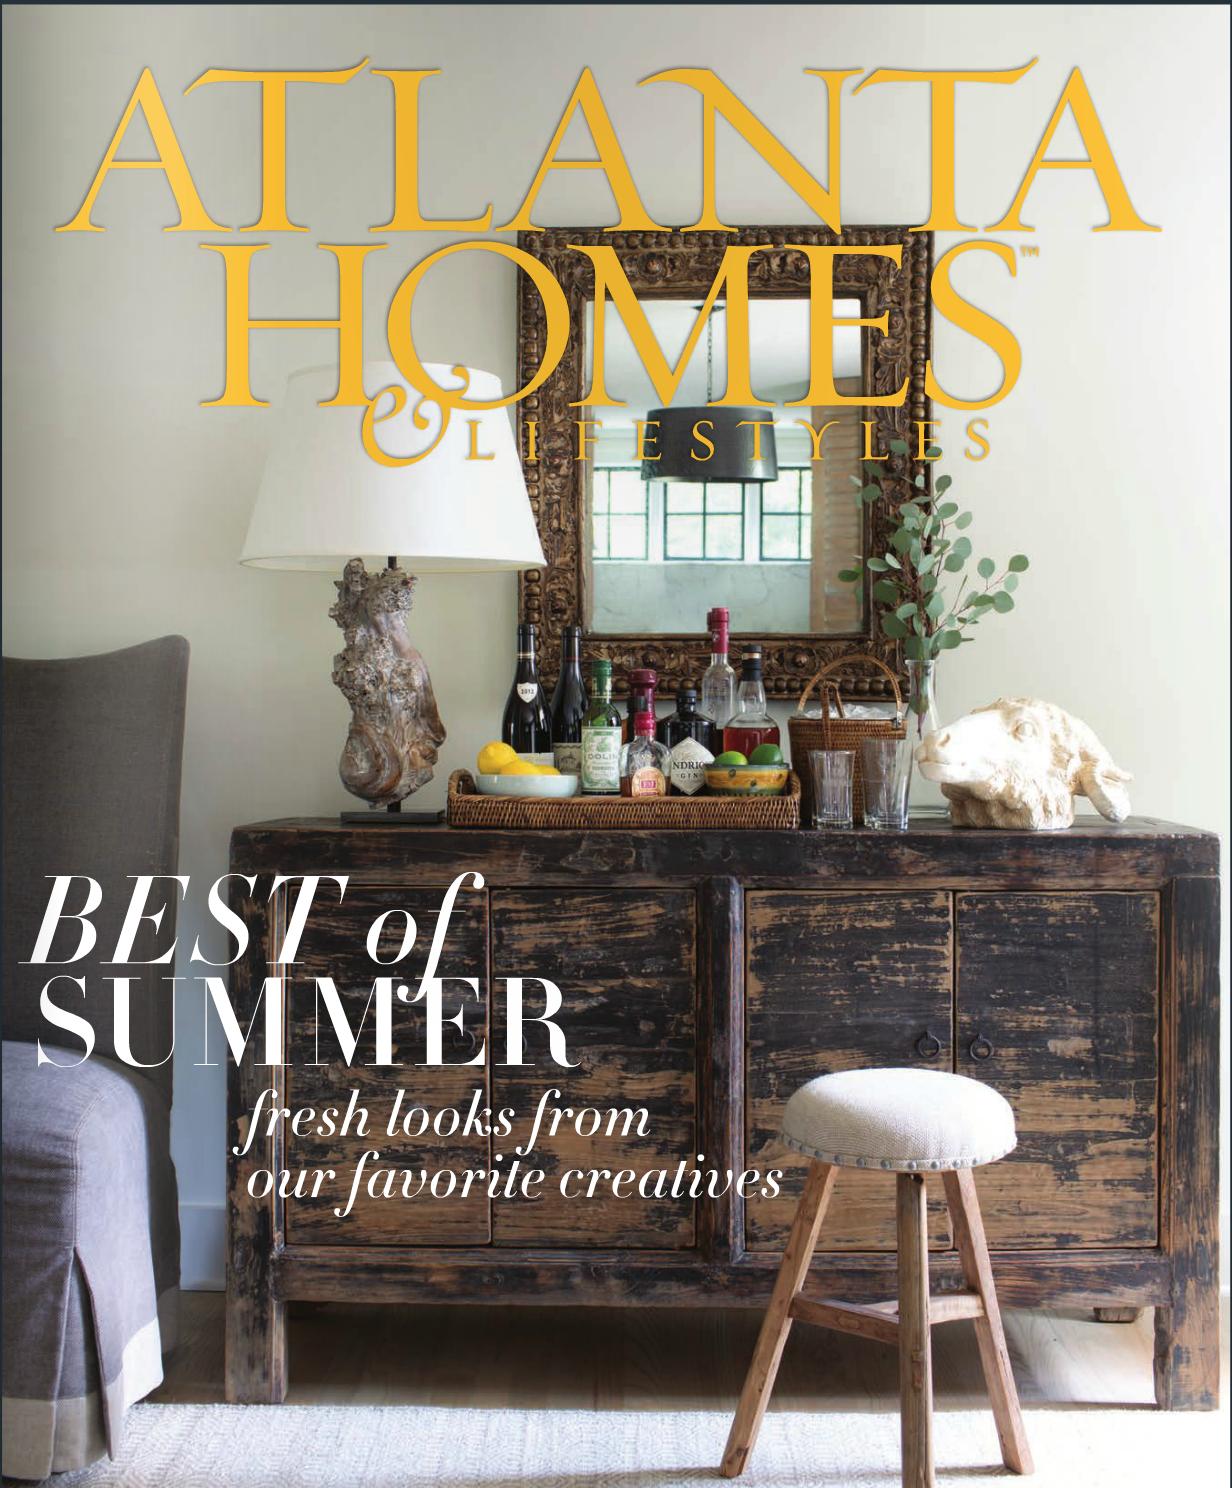 Atlanta Homes & Lifestyles: Summer 2015